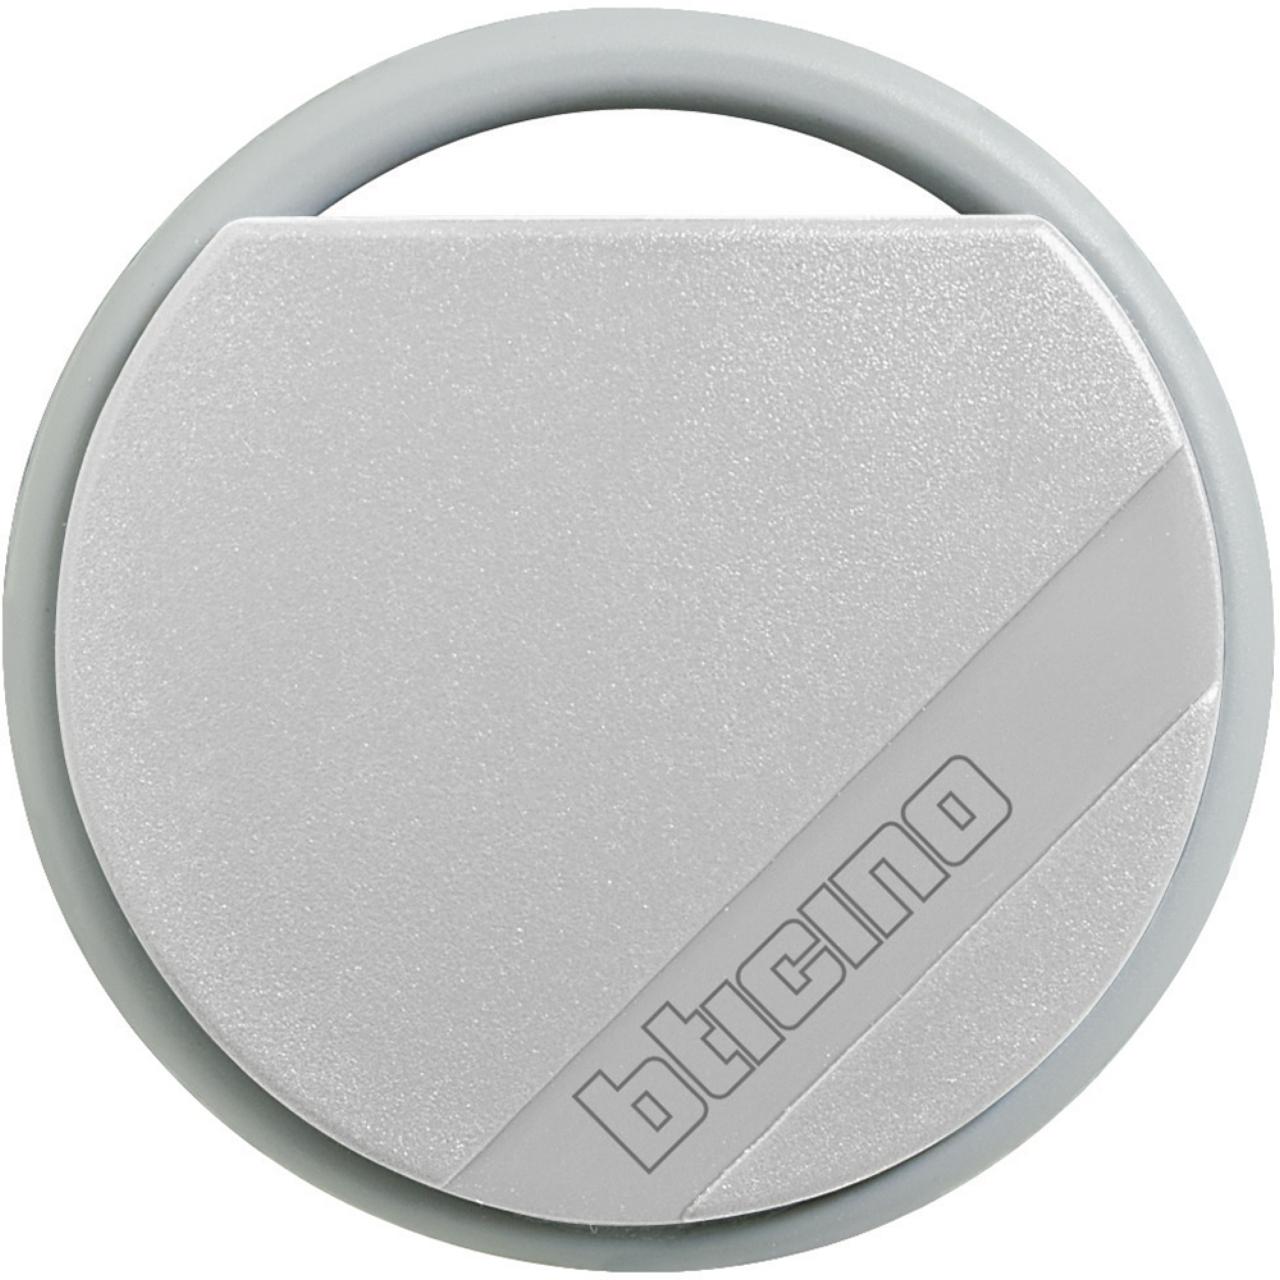 BTicino//Legrand badge VIGIK résident 13,56 MHz 348200  Clé de proximité